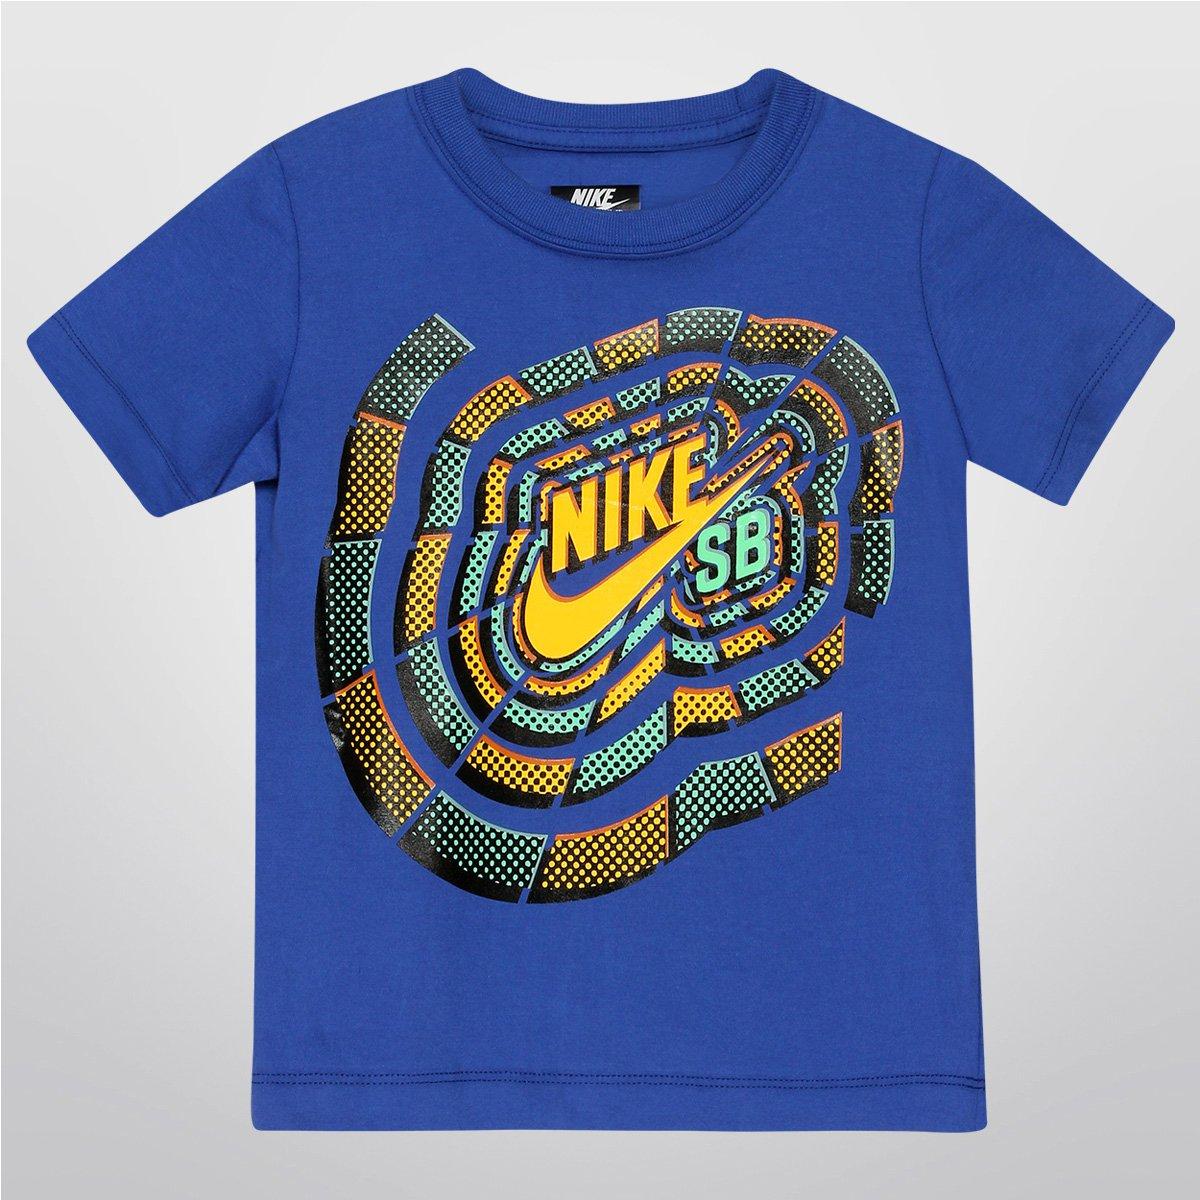 8c3870482c5eb Camiseta Nike SB Sunburst Tee Infantil - Compre Agora